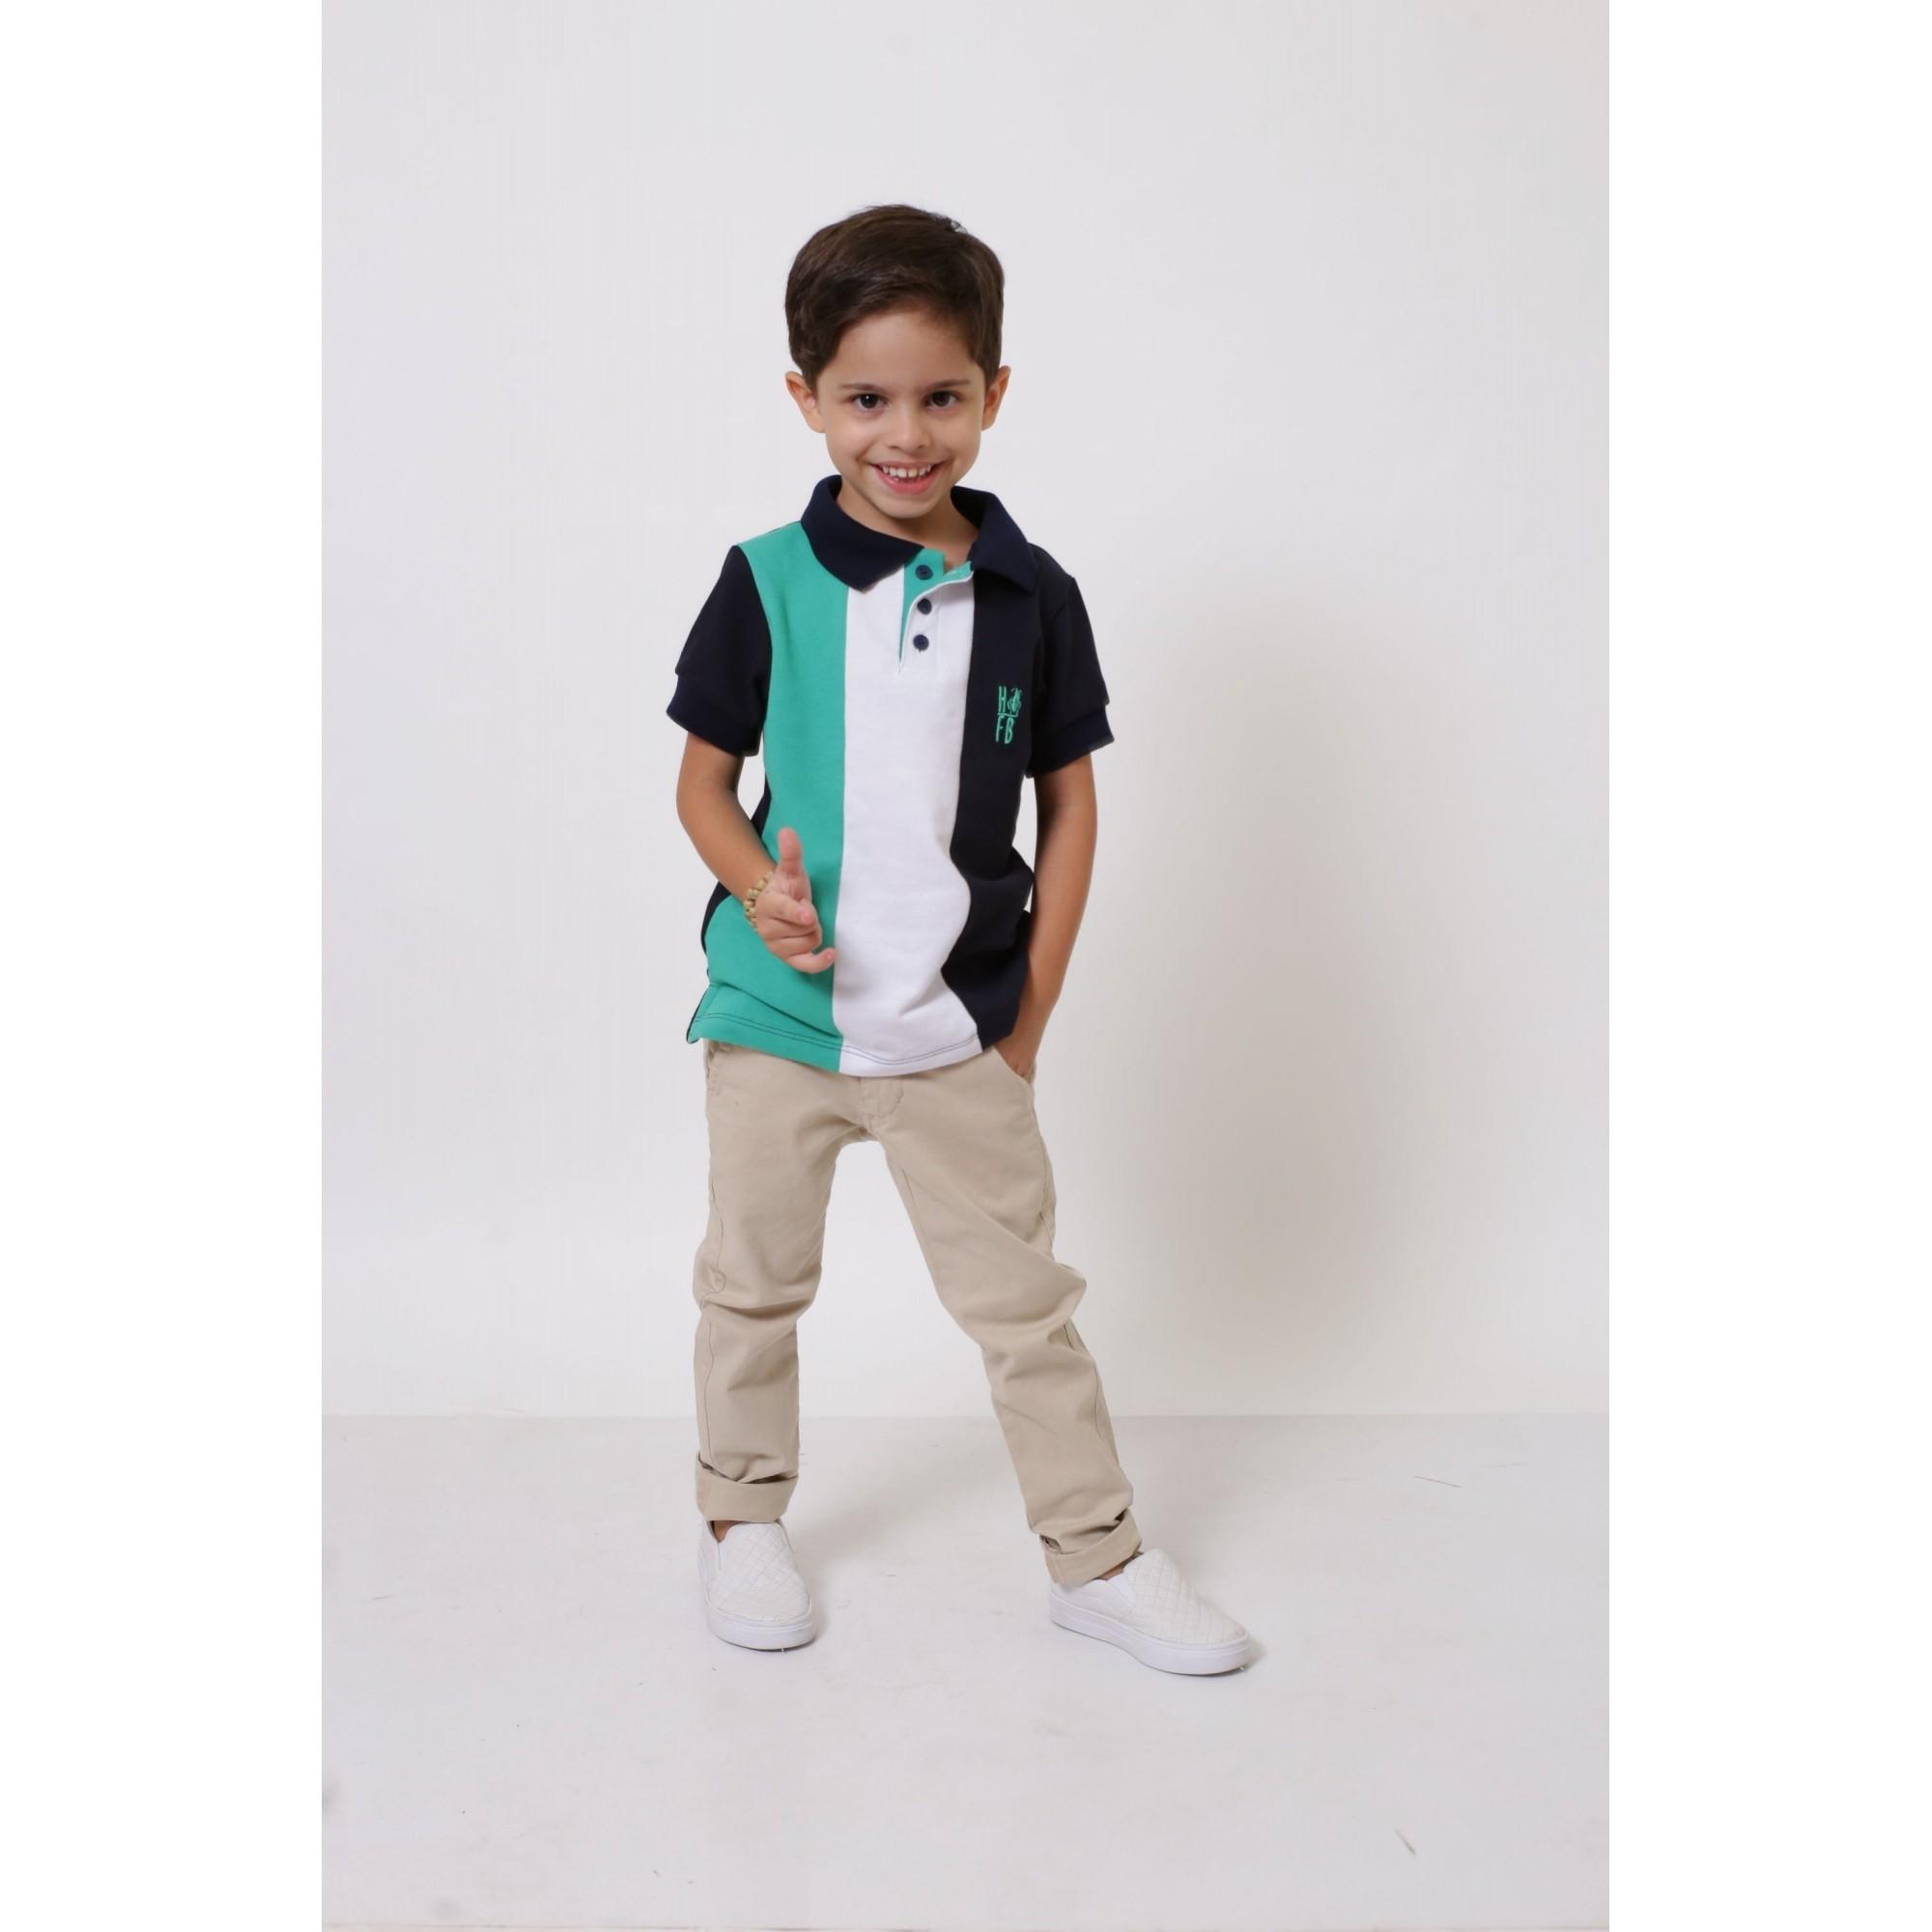 MÃE E FILHO > Kit 02 peças - Vestido + Camisa ou Body Polo - Listrados Prince [Coleção Tal Mãe Tal Filho]  - Heitor Fashion Brazil